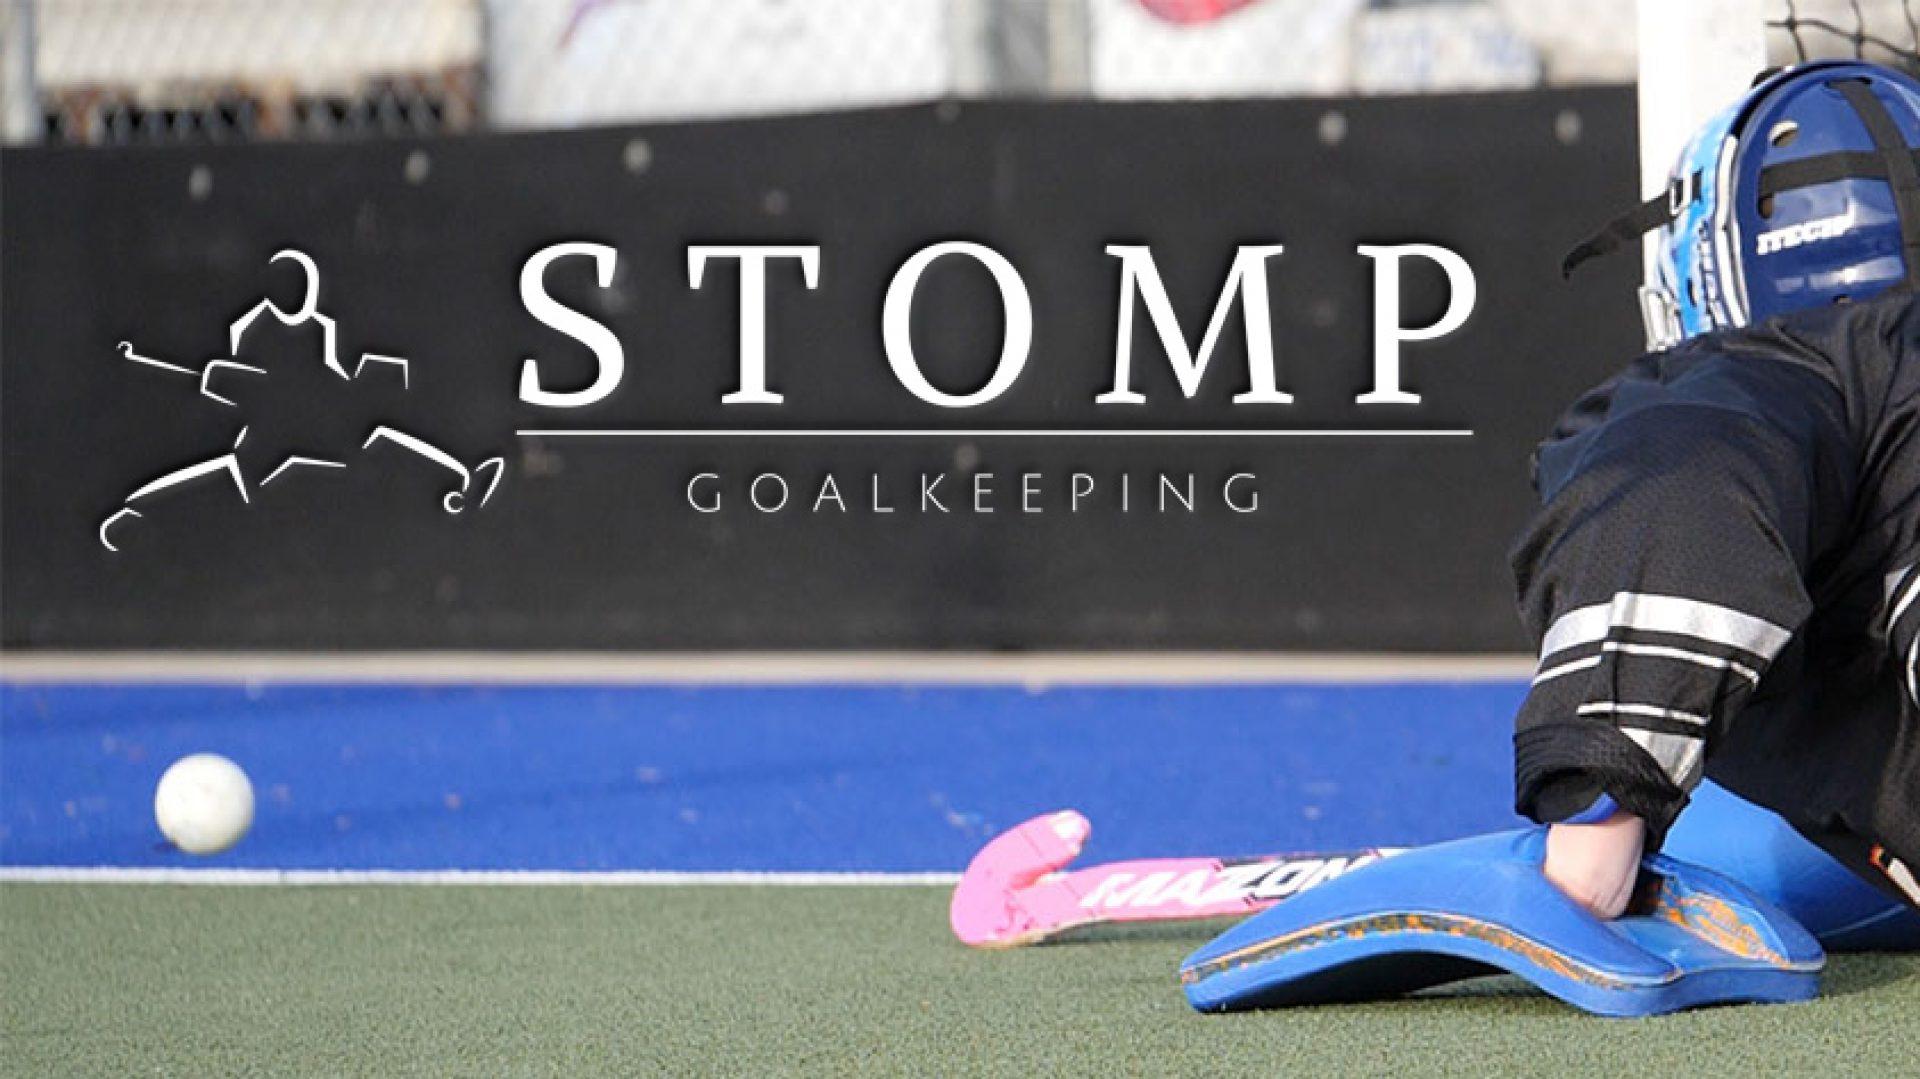 Stomp Goalkeeping